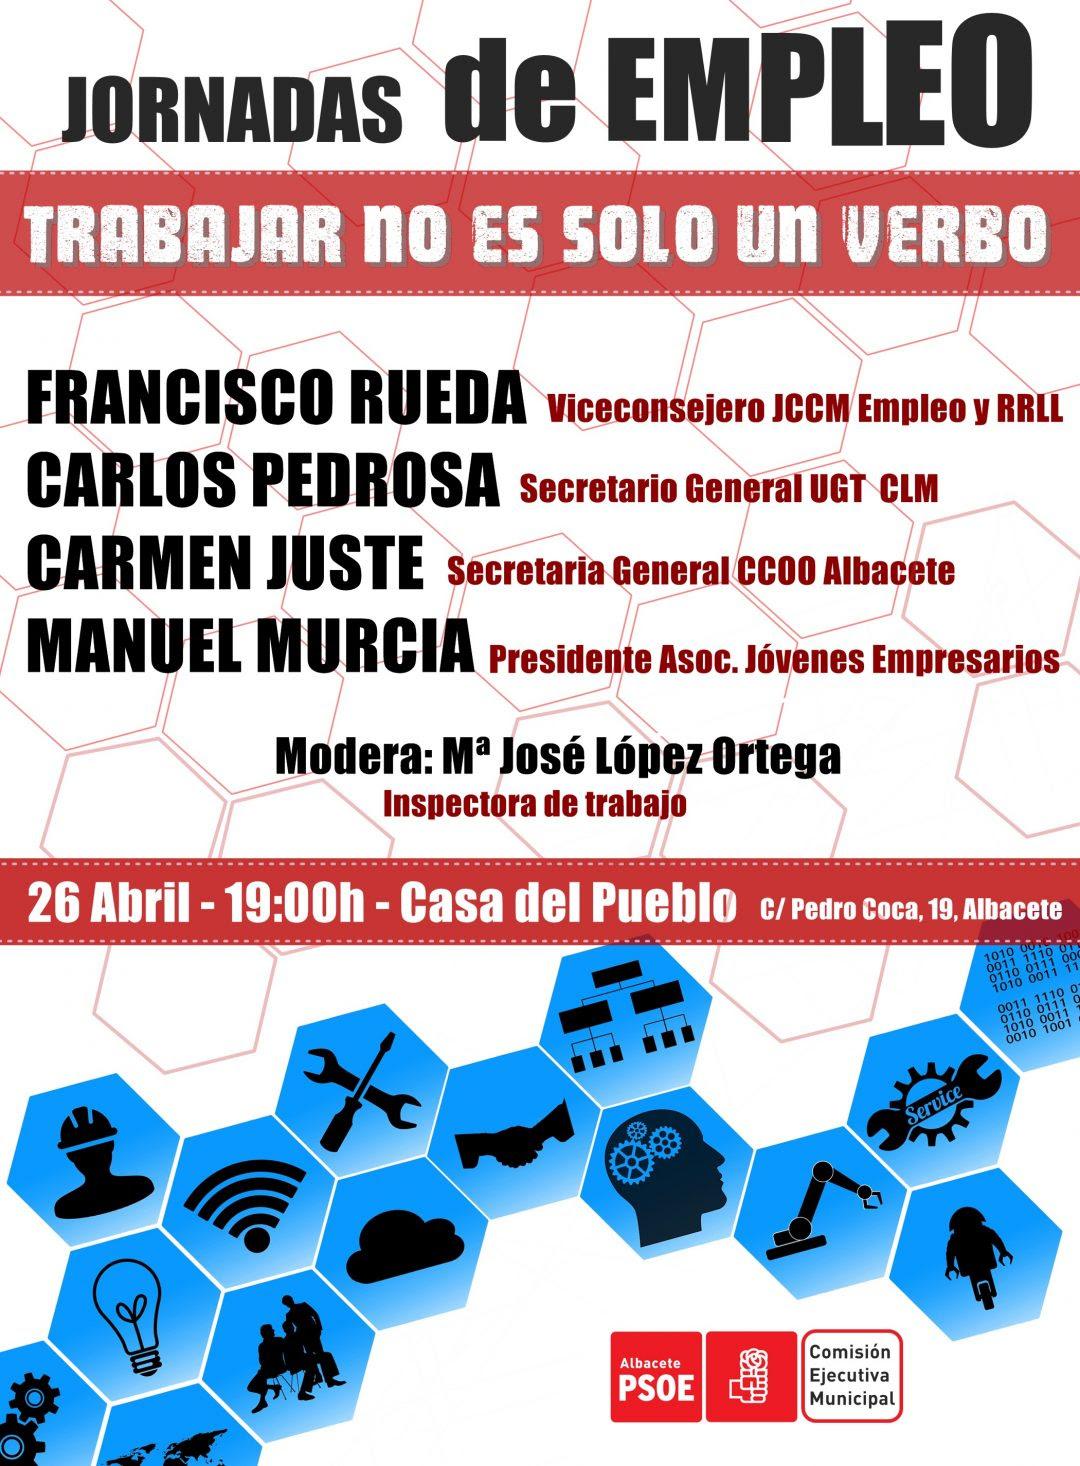 El Psoe De Albacete Organiza Una Jornada Sobre Empleo En El - roblox abc news level 6 hack roblox